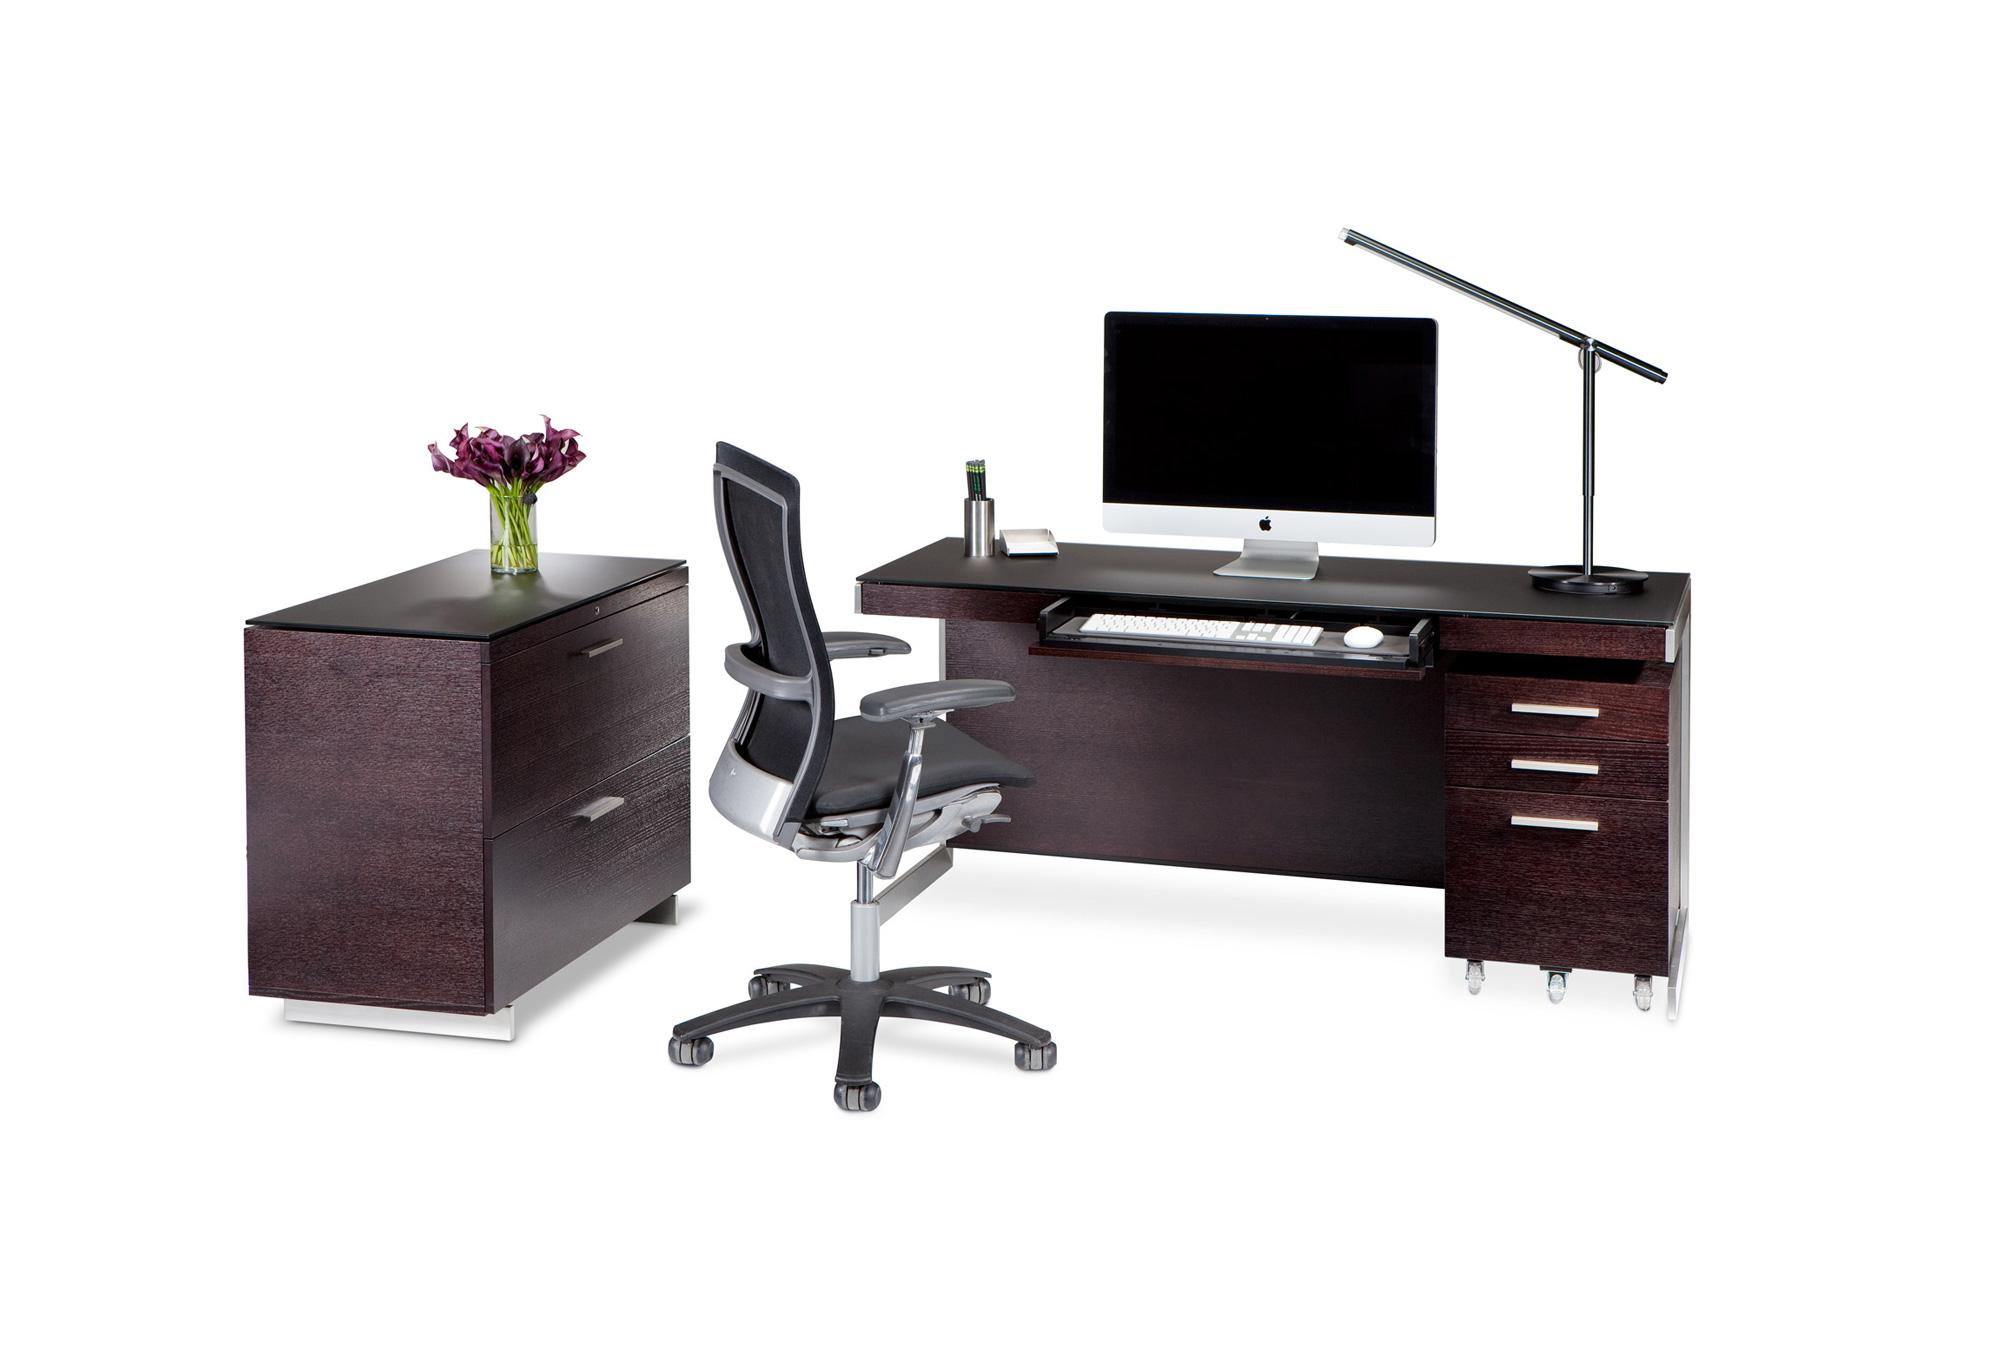 Sequel Desk 6001 Explore Site Previous Next Bdi